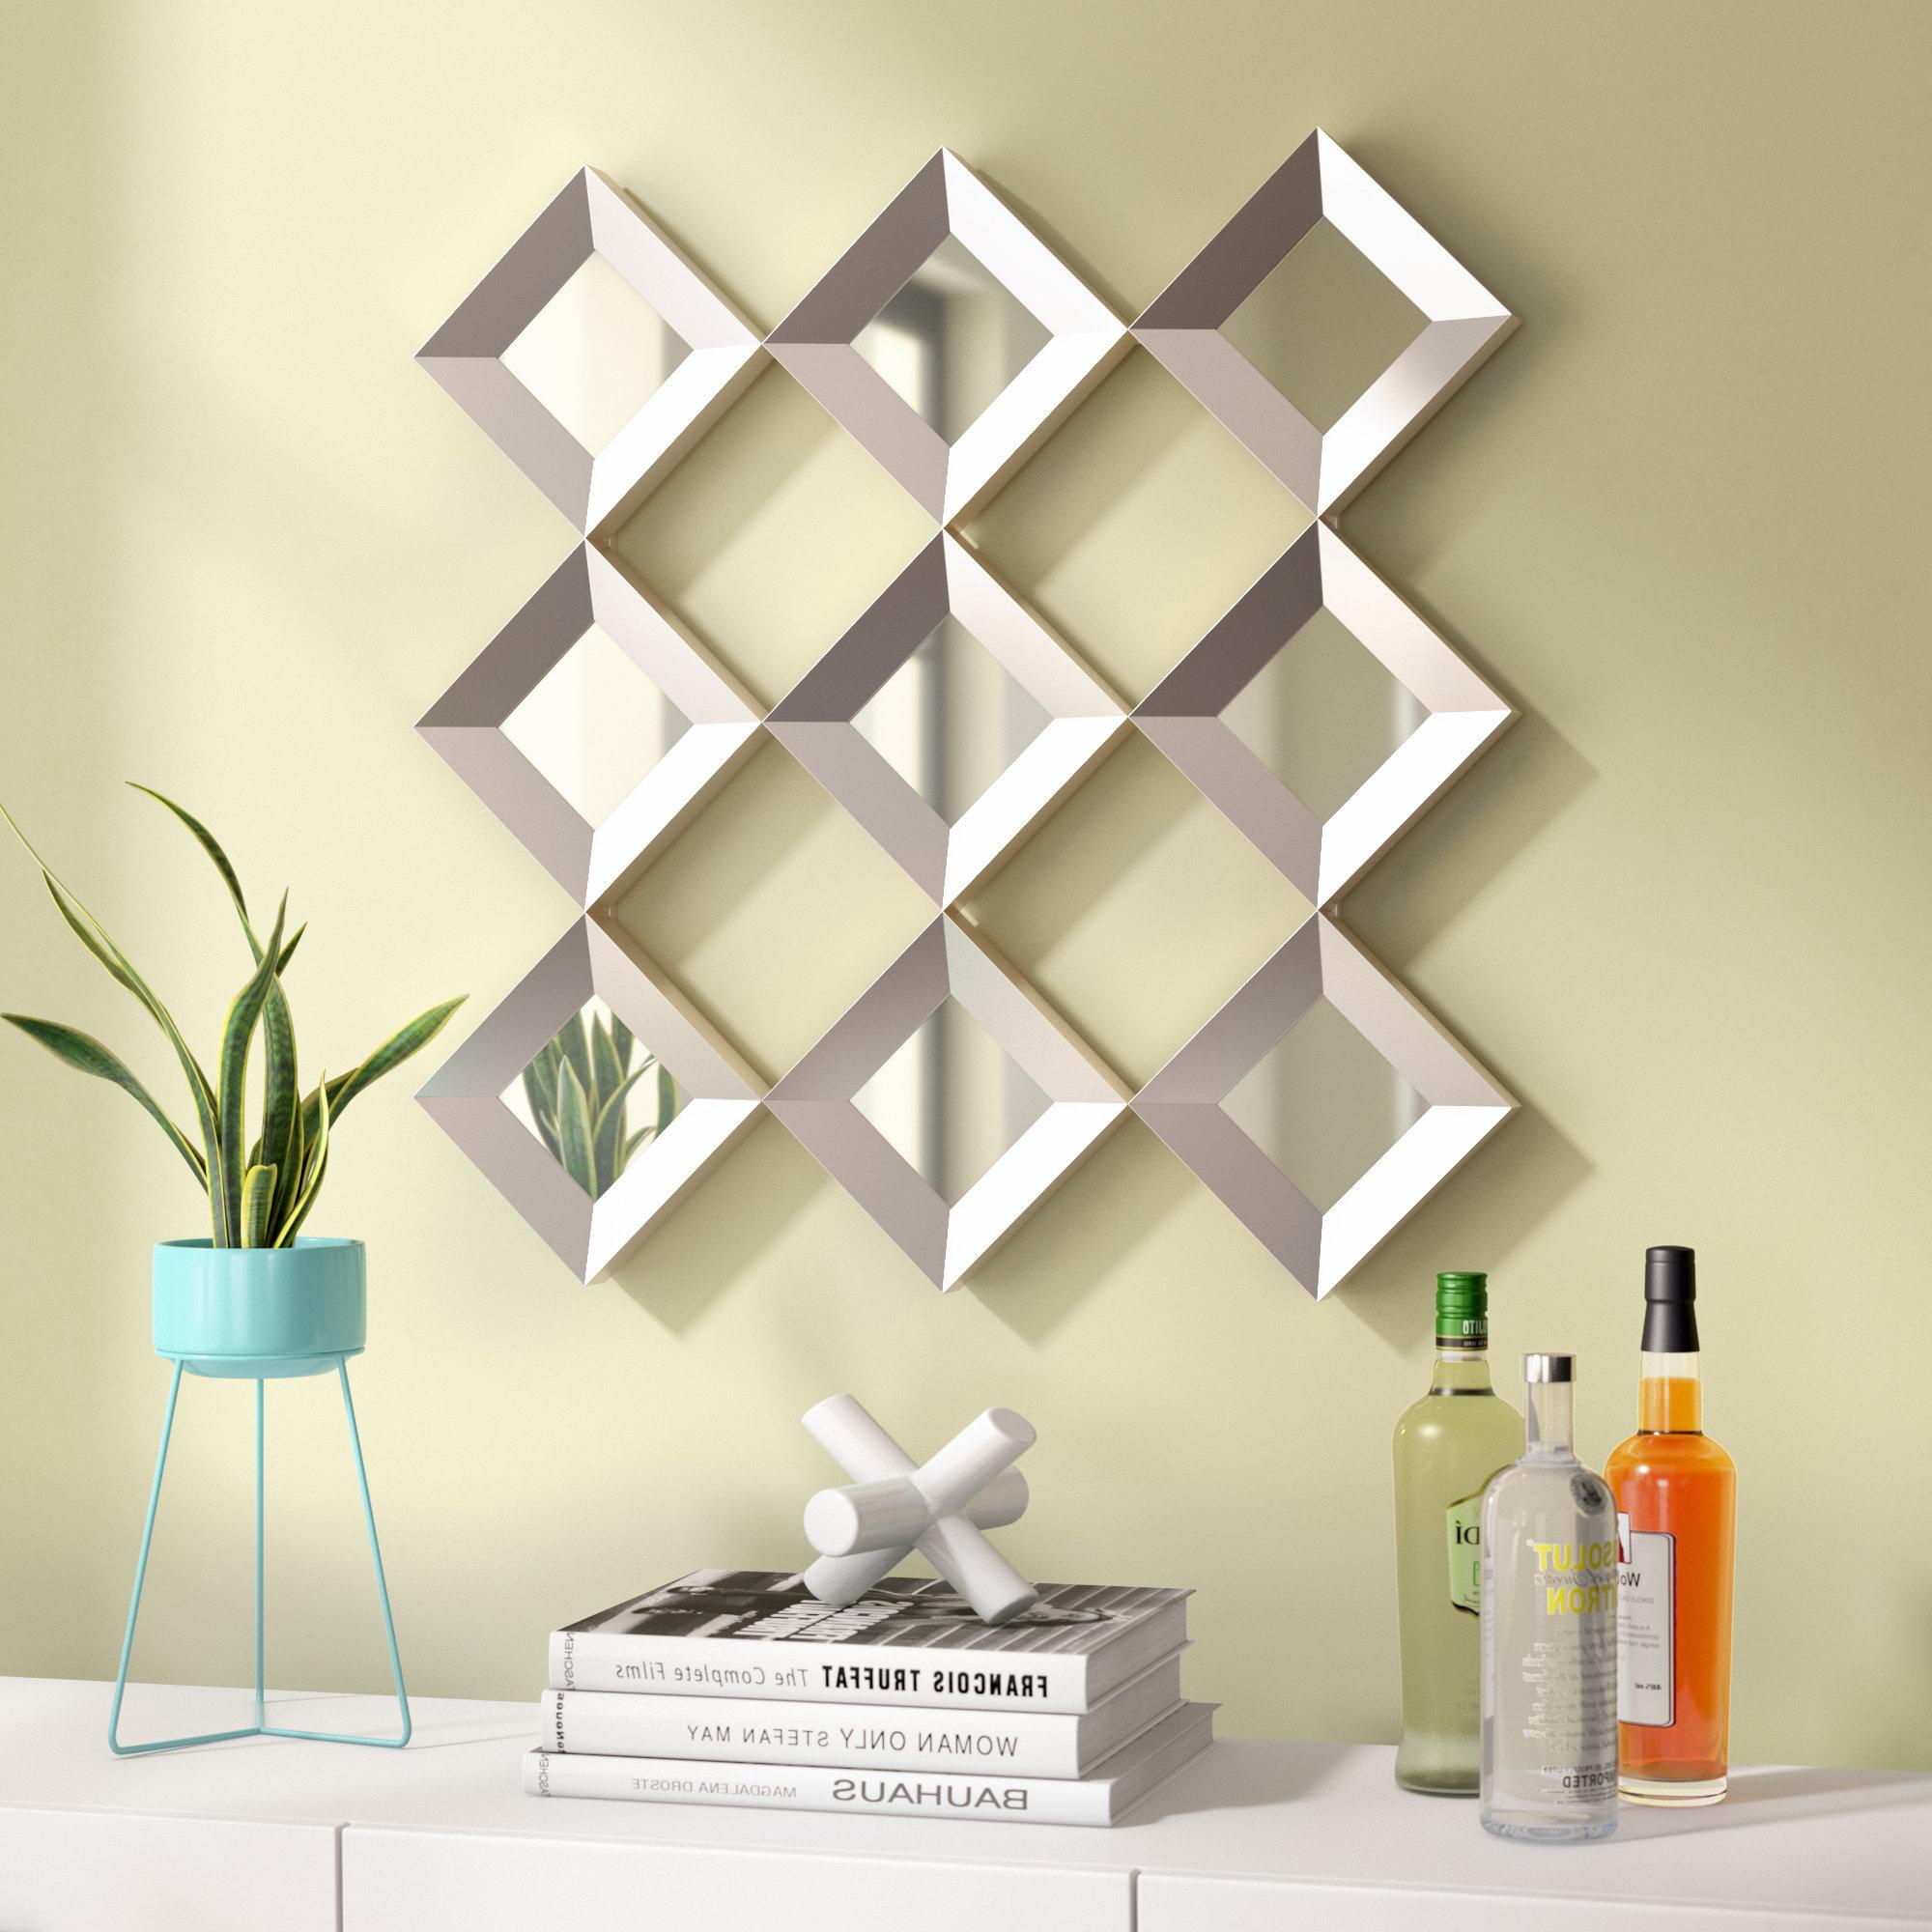 Fashionable Fredela Decorative Wall Mirror With Cheap Decorative Wall Mirrors (View 18 of 20)